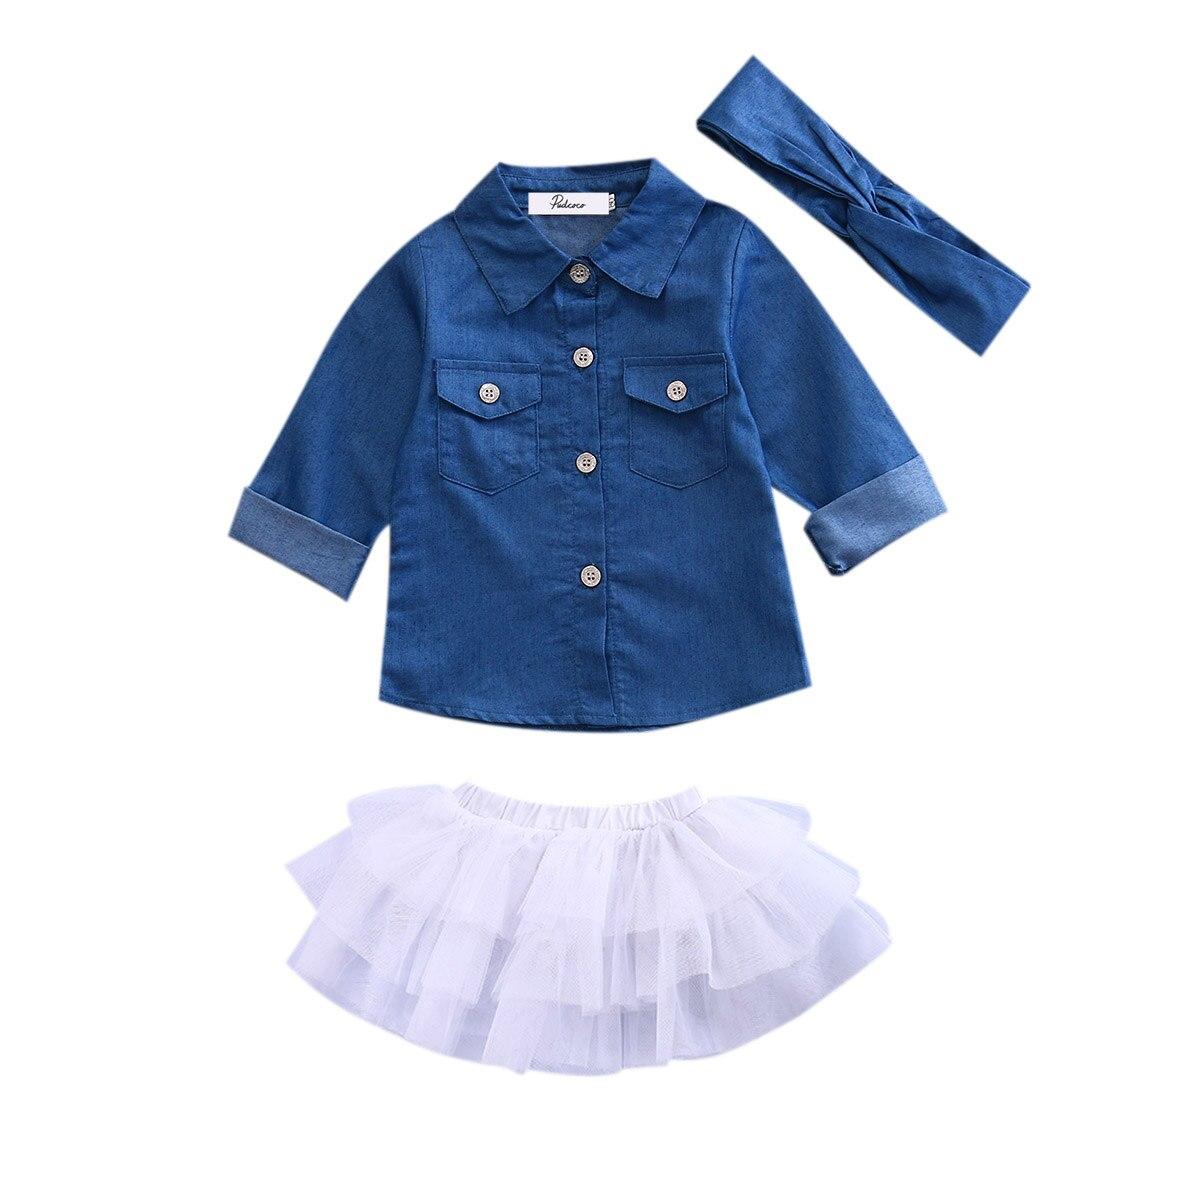 Toddler Kids Baby Girls Denim Tops T shirt Tutu Skirts 3pcs Outfits Set Enfant Children Girl Summer Cute Clothing